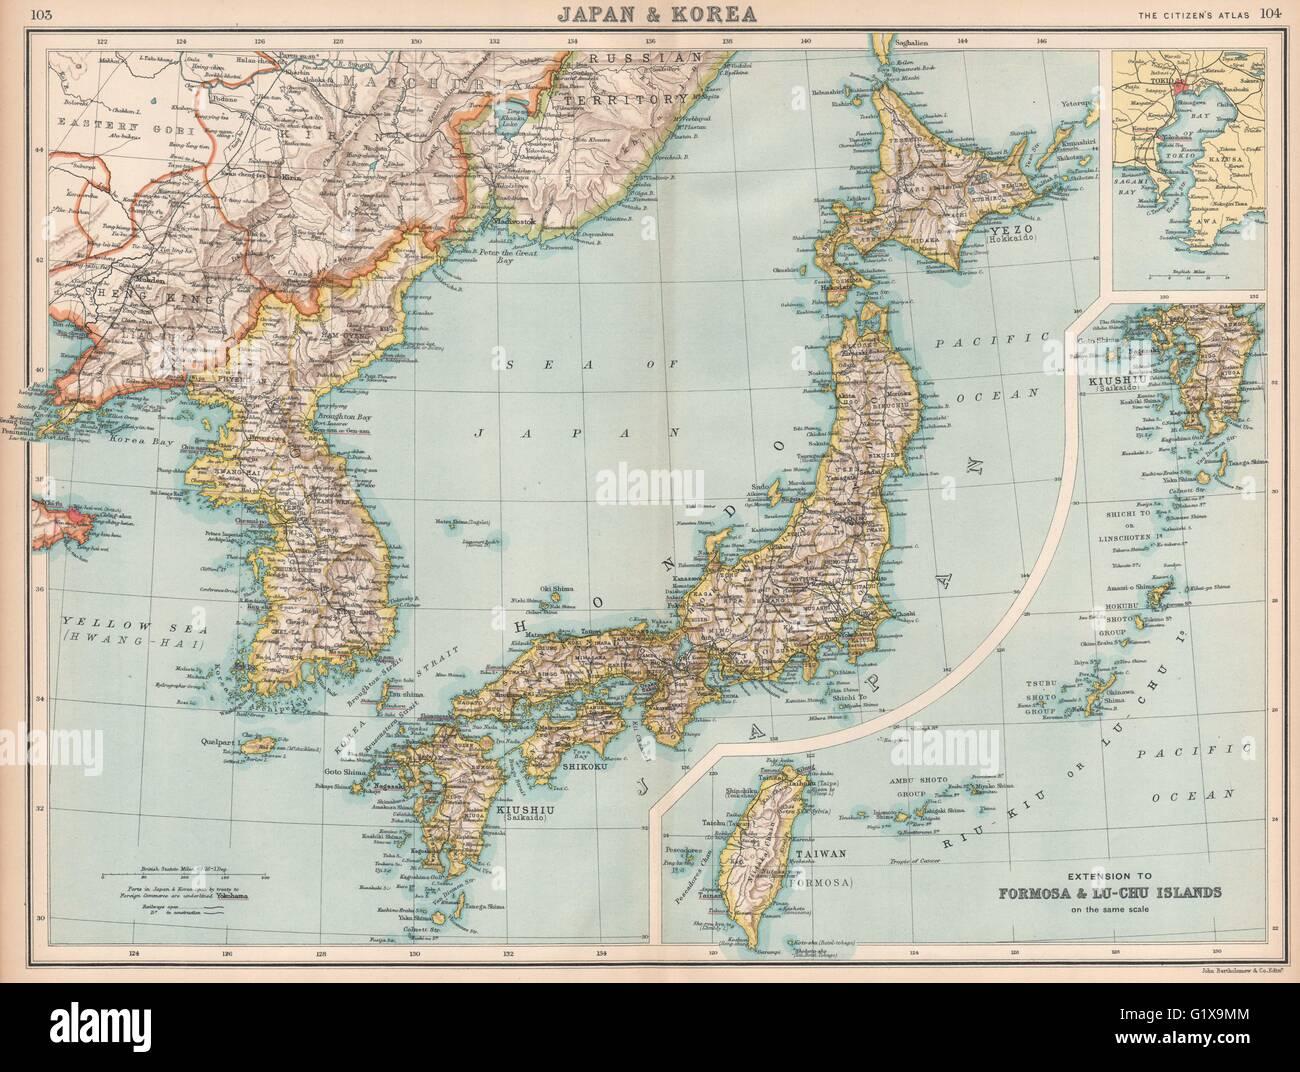 Japan korea inset tokyo bay formosa taiwan railways stock photo japan korea inset tokyo bay formosa taiwan railways bartholomew 1912 map gumiabroncs Images